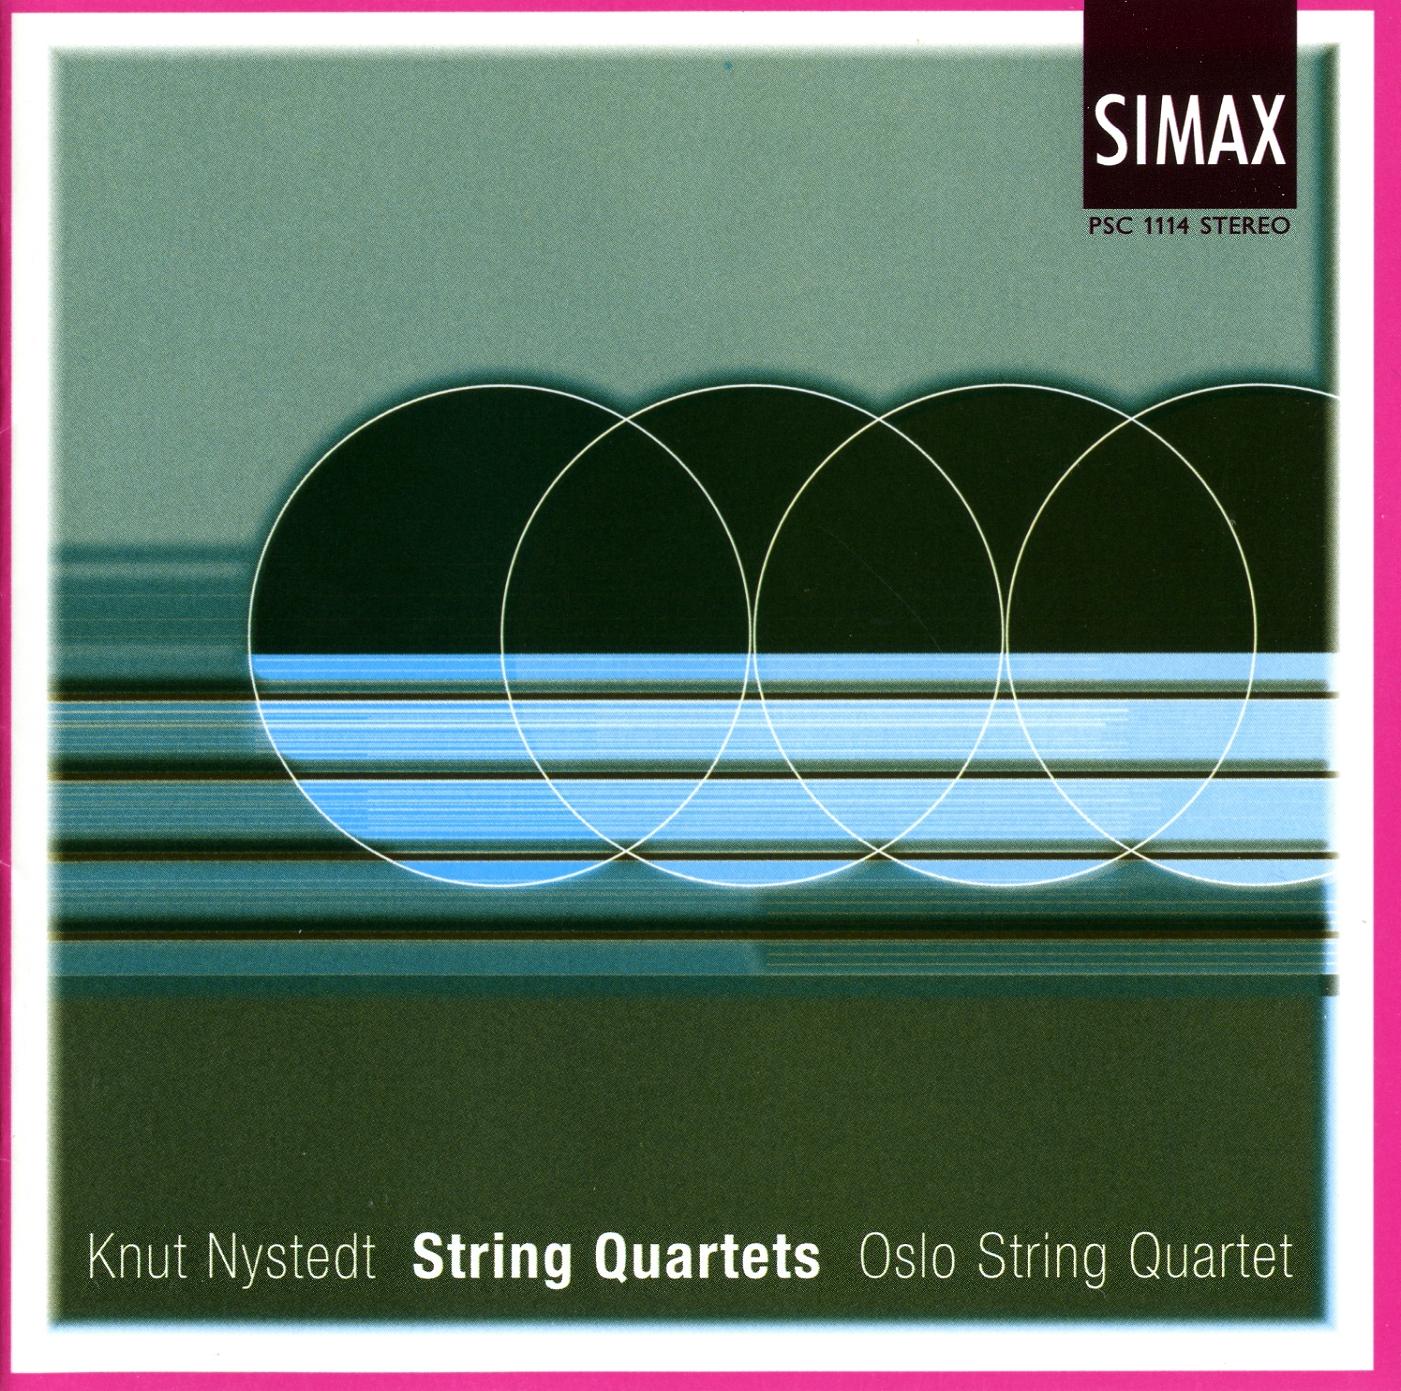 Knut Nystedt:String quartets - Oslo String QuartetRecorded by Pro Musica/ Jørn Pedersen in January 1994 in Salen, SkiProducer: Krzyzstof DrabSIMAX PSC 1114